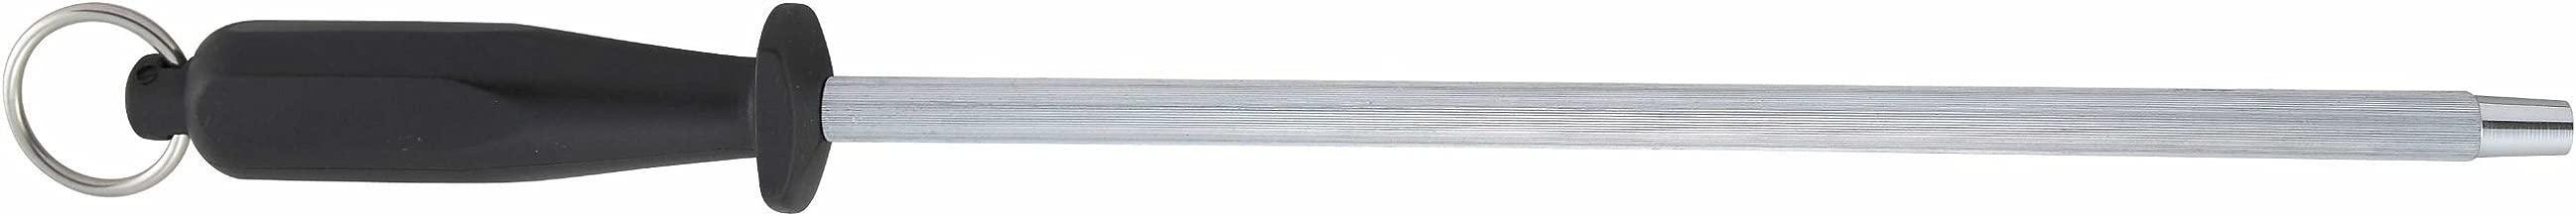 Winware Stainless Steel Sharpening Steel, 12-Inch